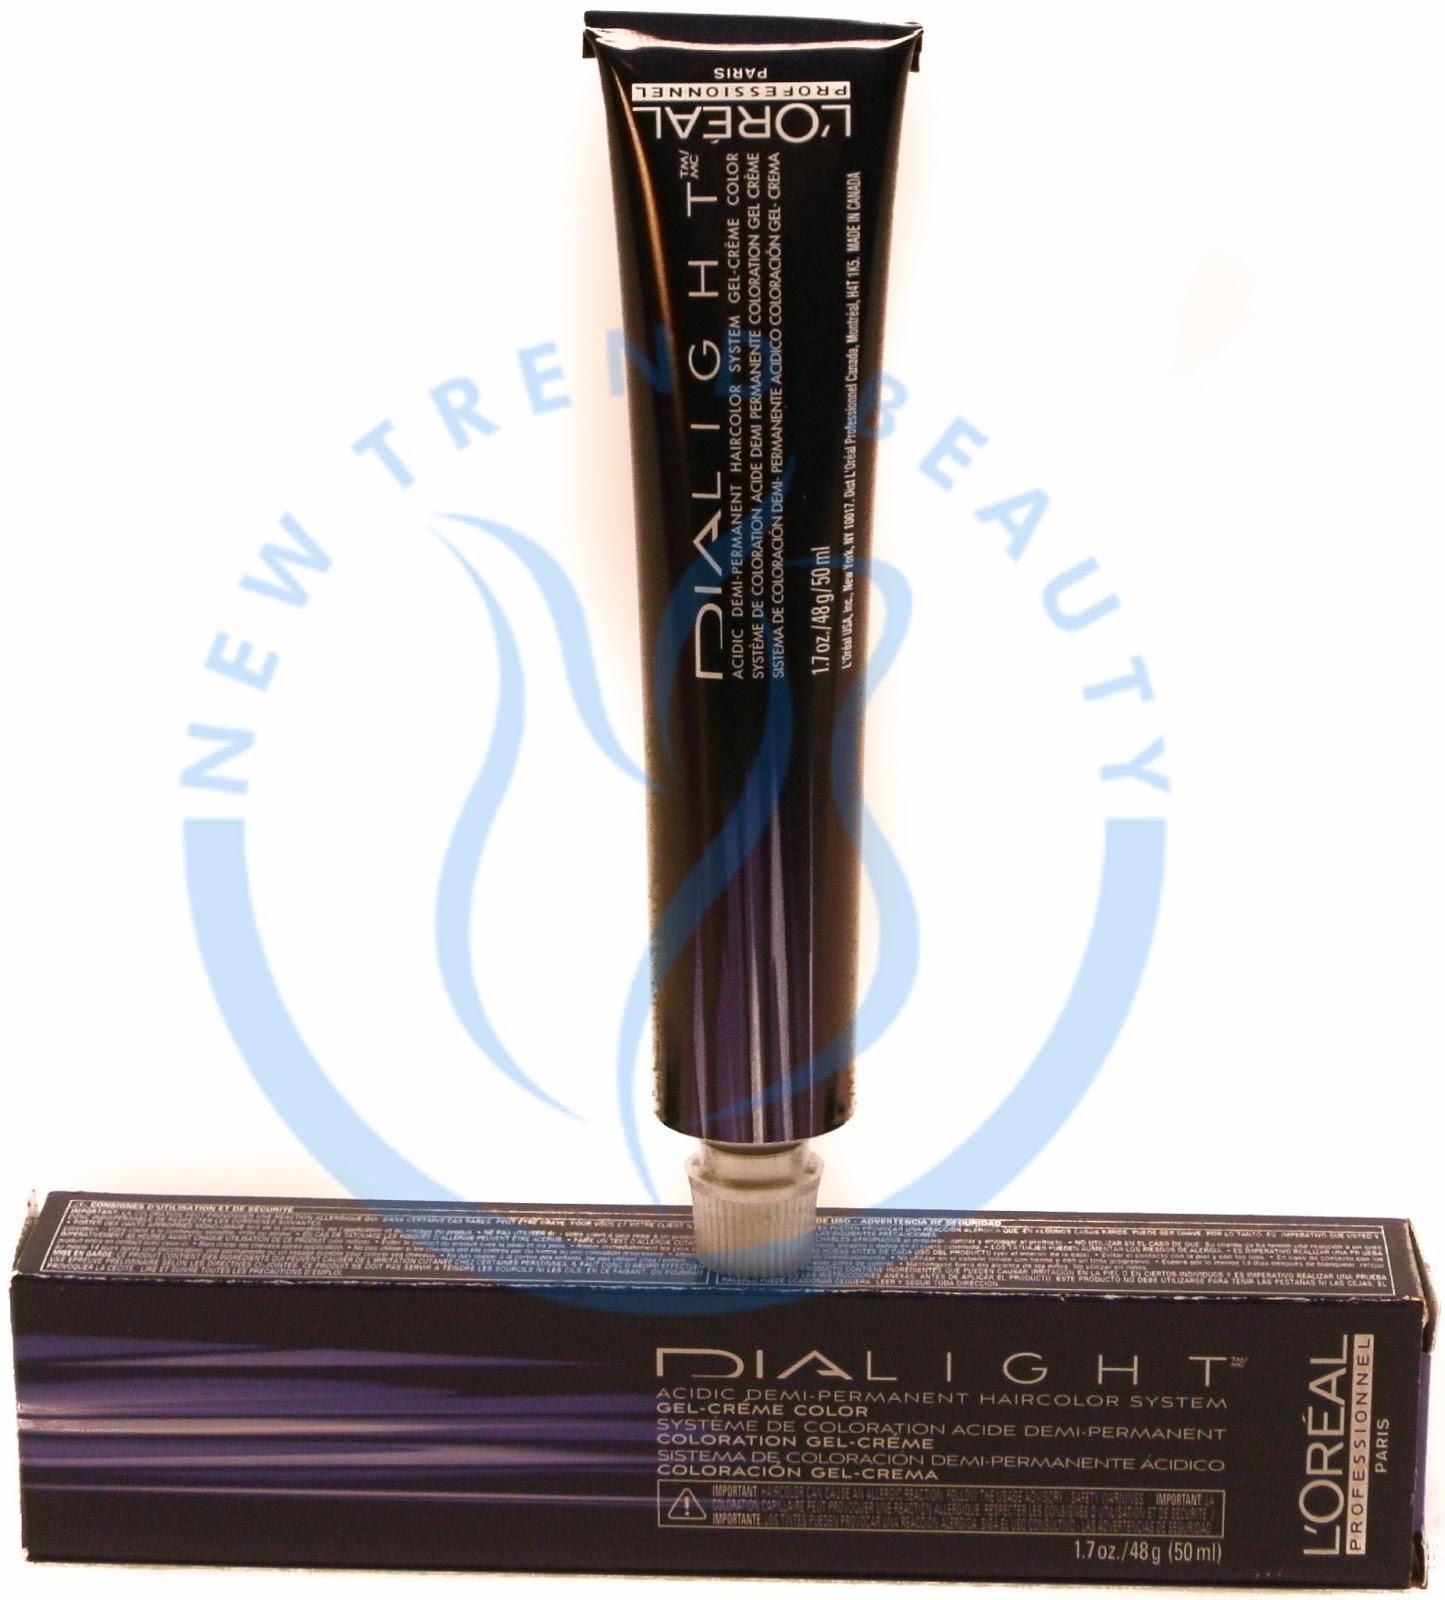 Loreal Professional Dialight Hair Color Loreal Demi Permanent